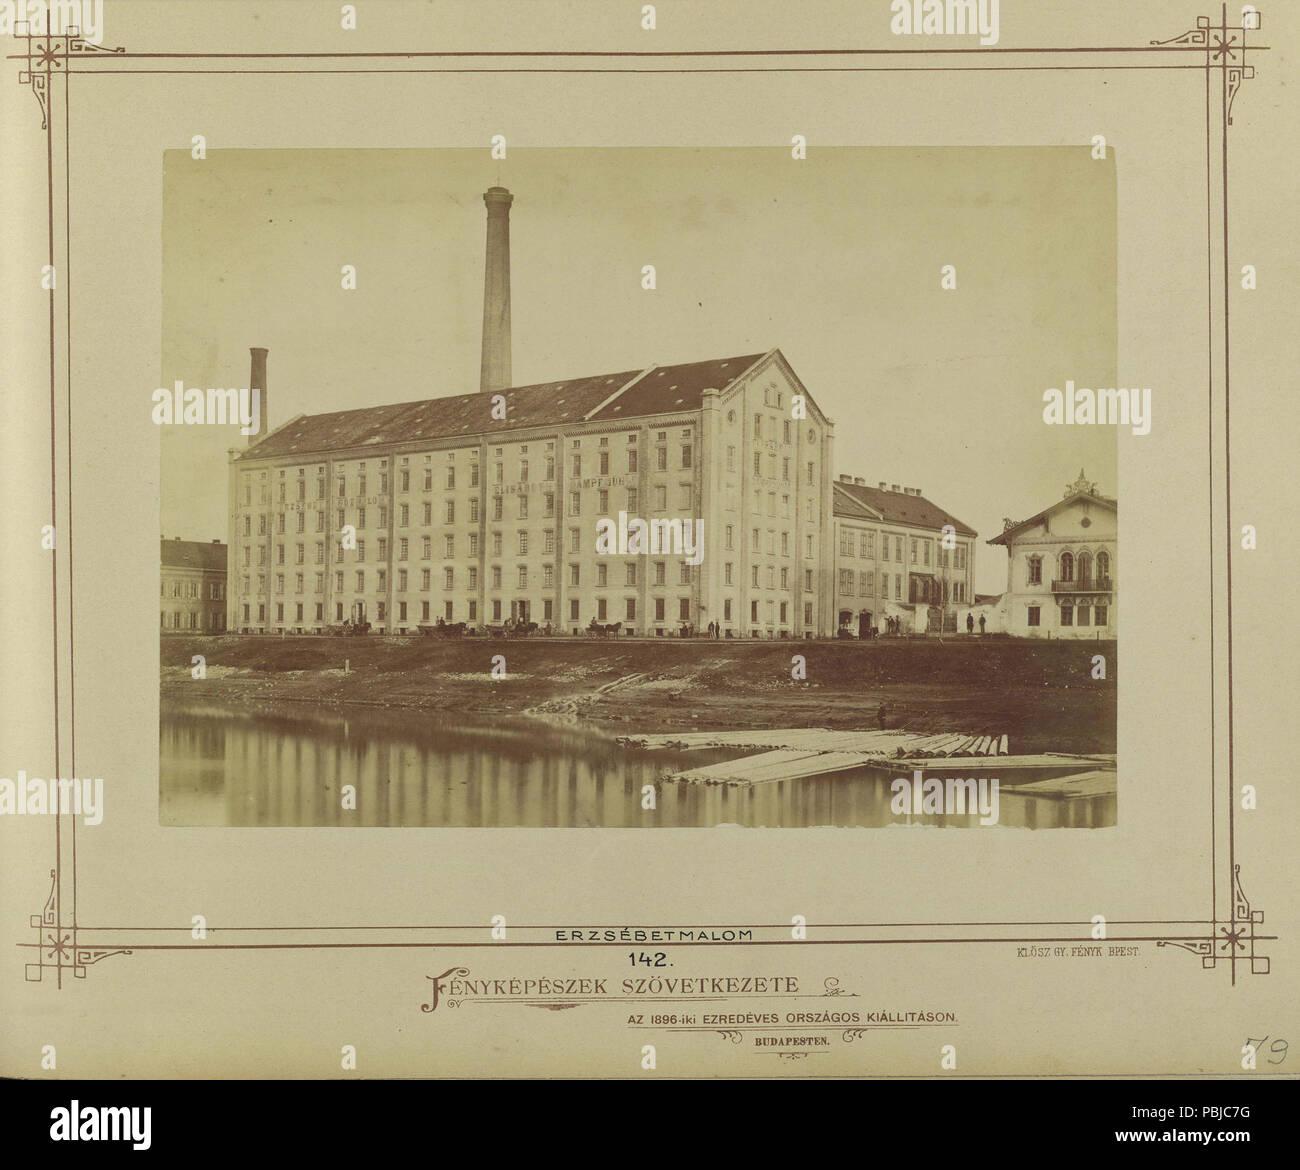 1883 Újpesti rakpart, Erzsébet gőzmalom. - Budapest, Fortepan 82210 - Stock Image